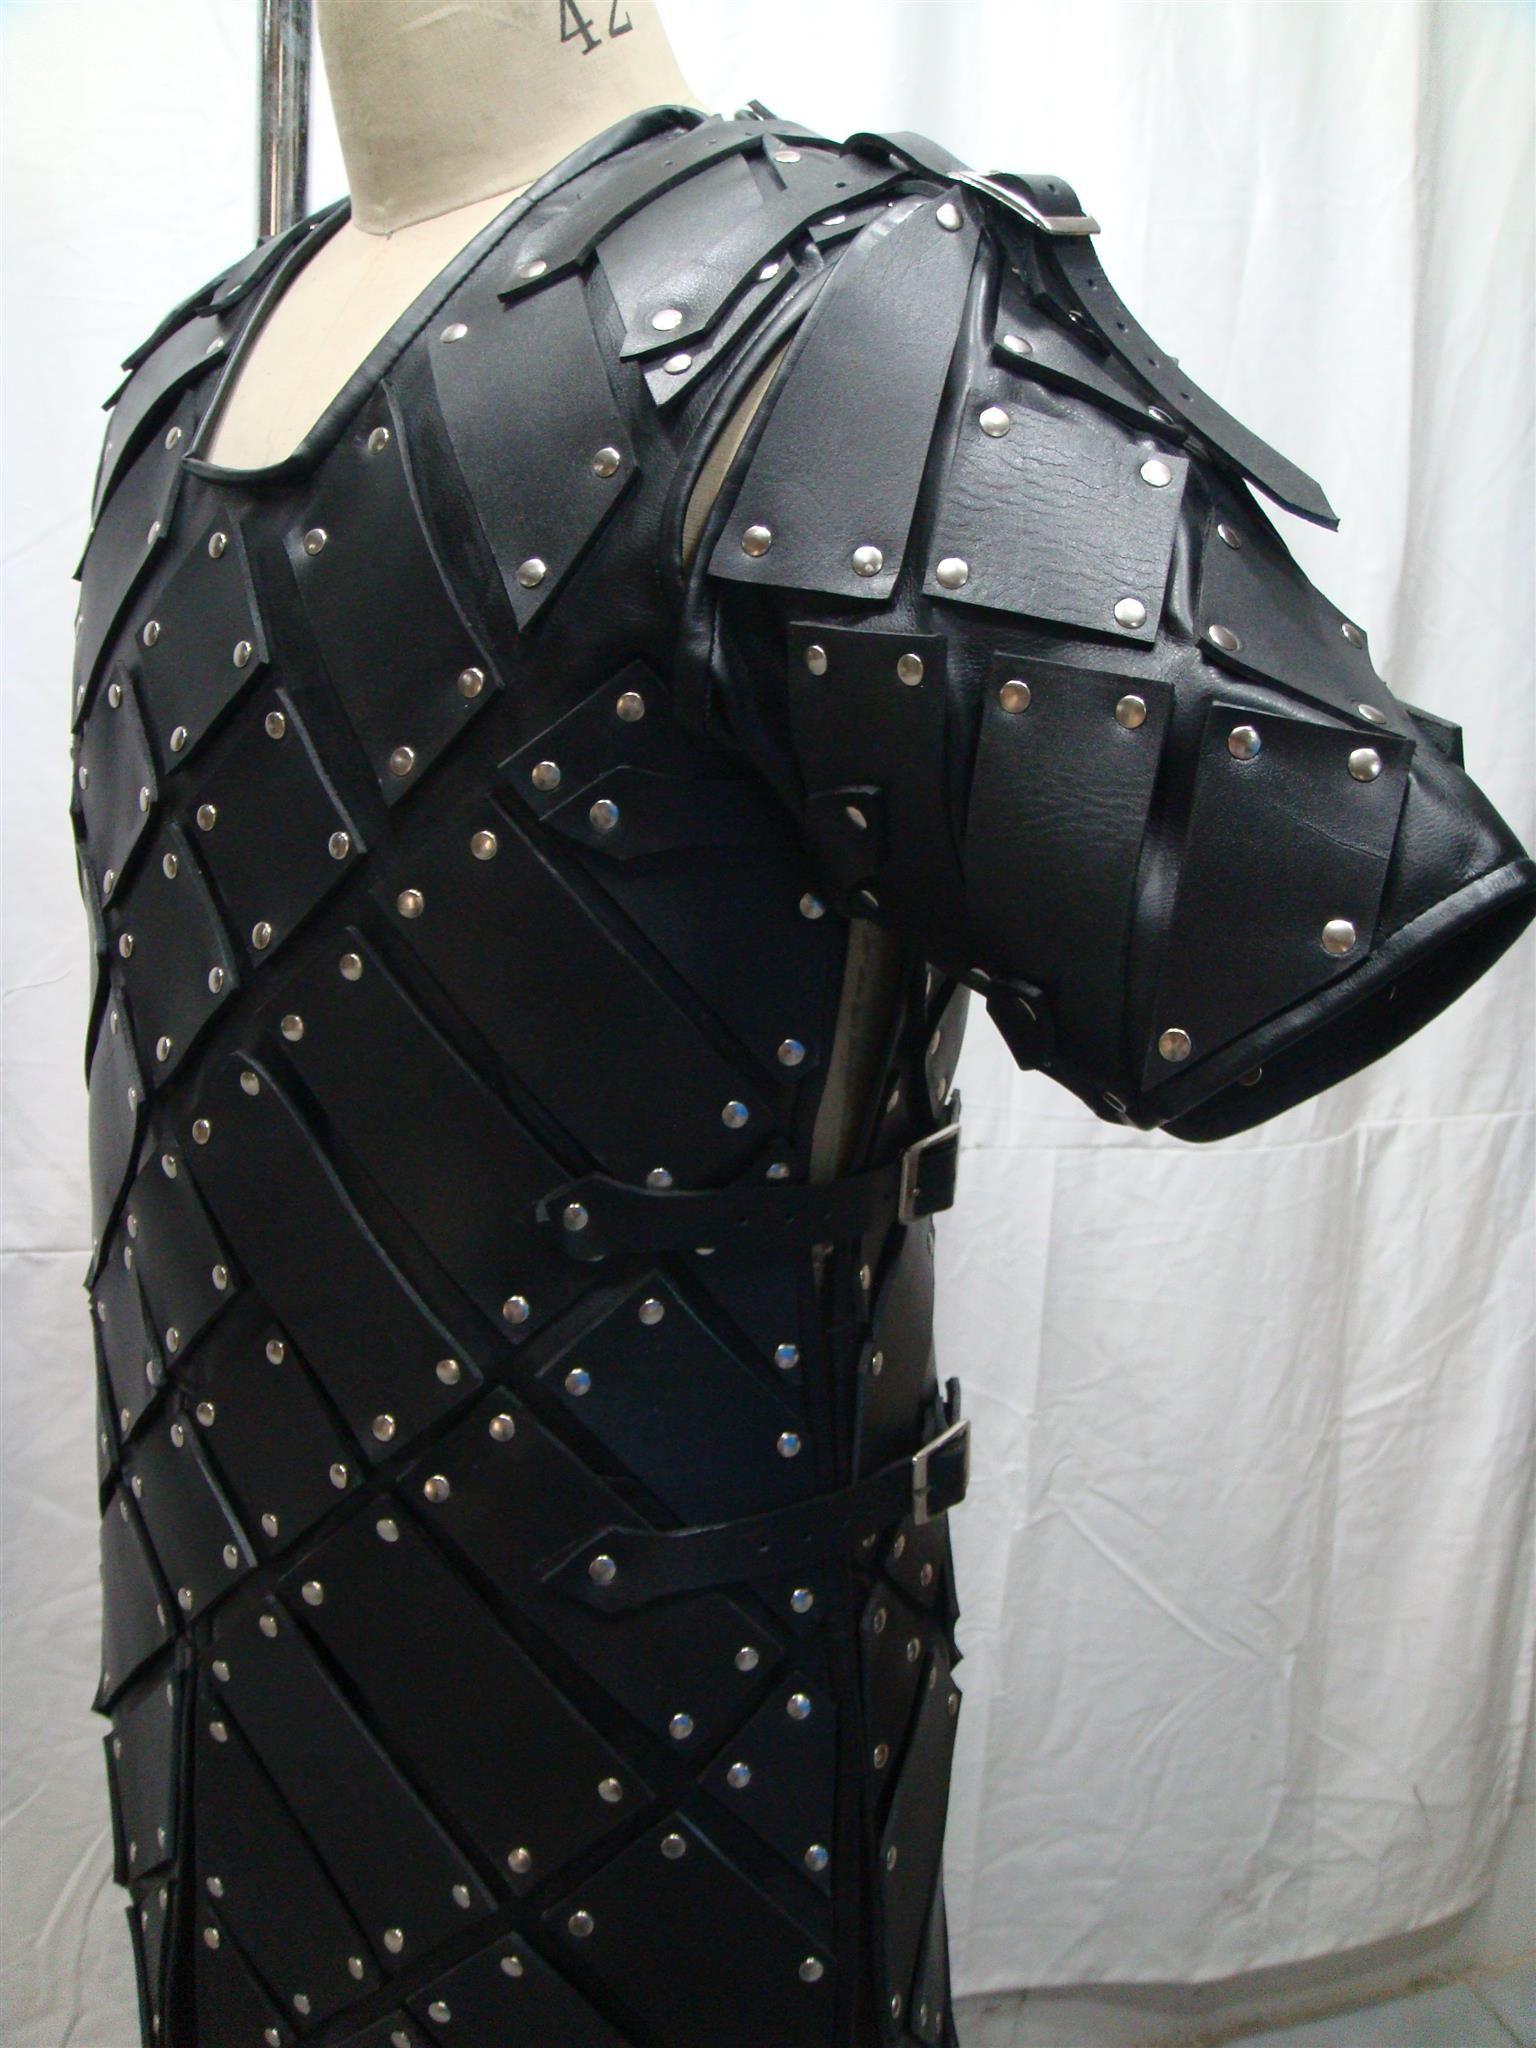 MEDIEVAL VEST ARMOR COSTUMES DRESS GENUNINE LEATHER SCA//LARP COSTUMES DRESS